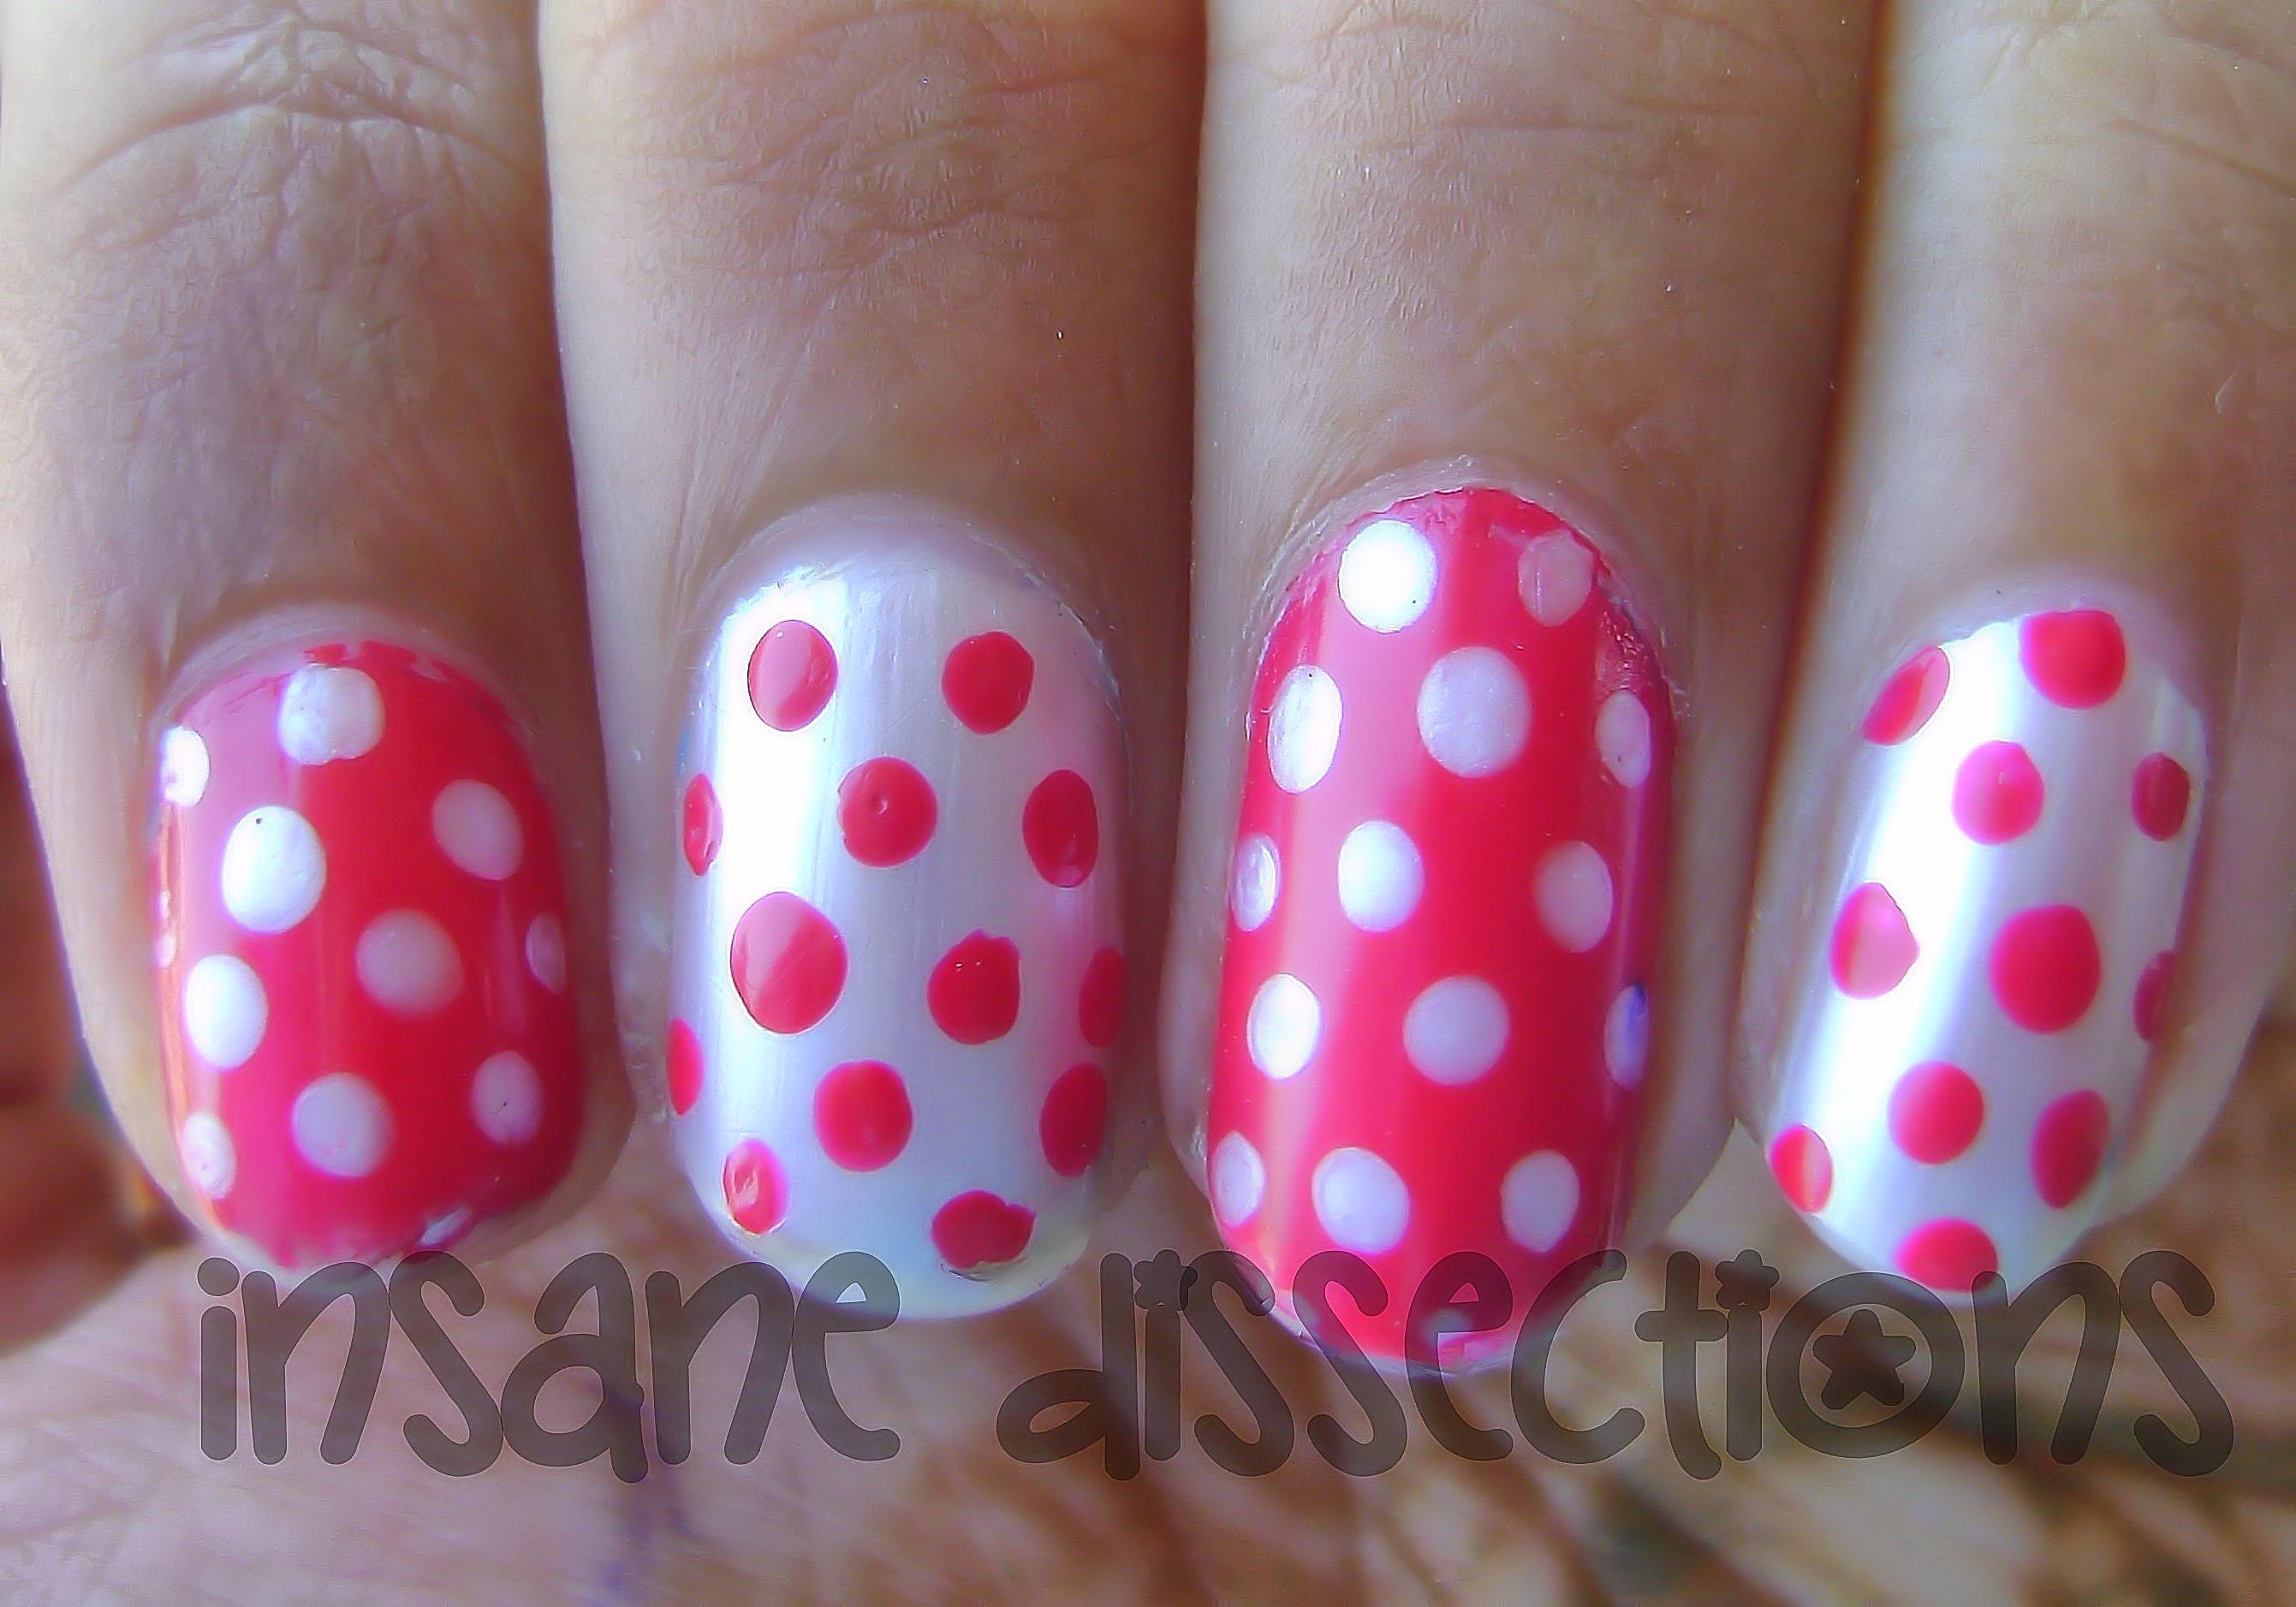 lakme nail polish | Insane Dissections